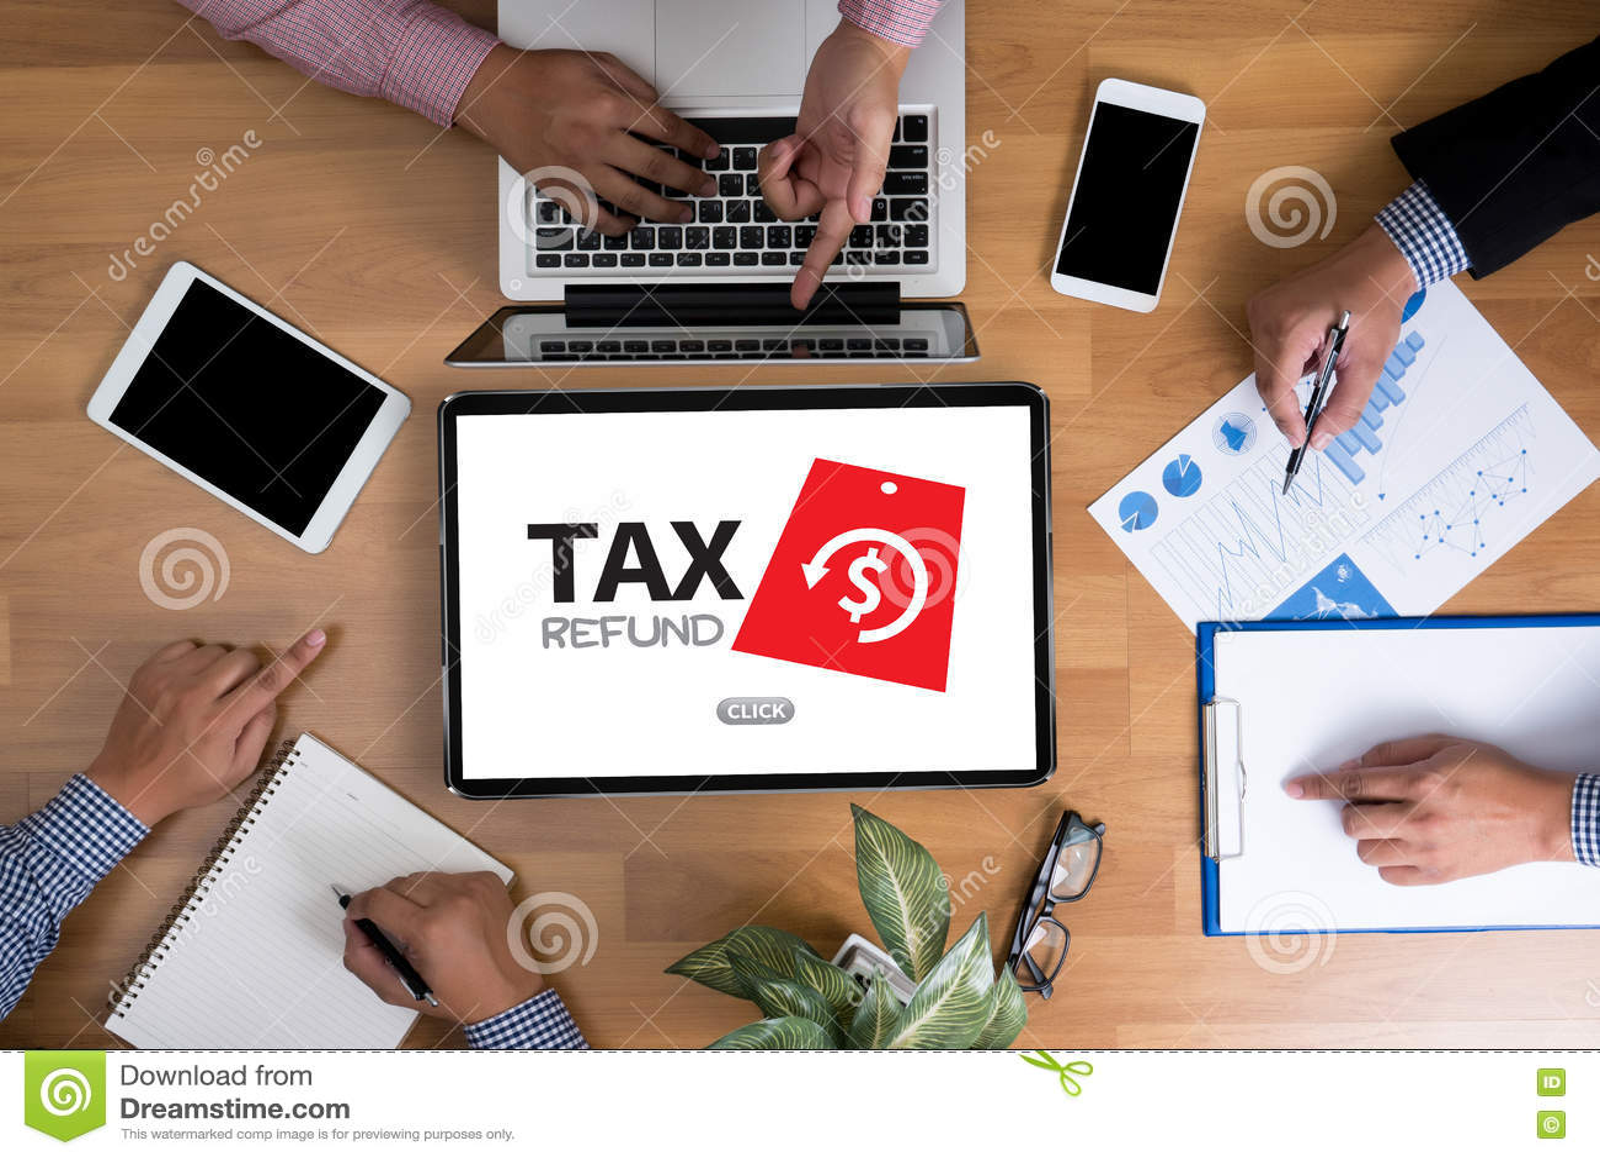 where to report book royalties on tax return Home reviews product reviews where to report book royalties – 687677 you must report it on your tax return june walker | writers, beware.